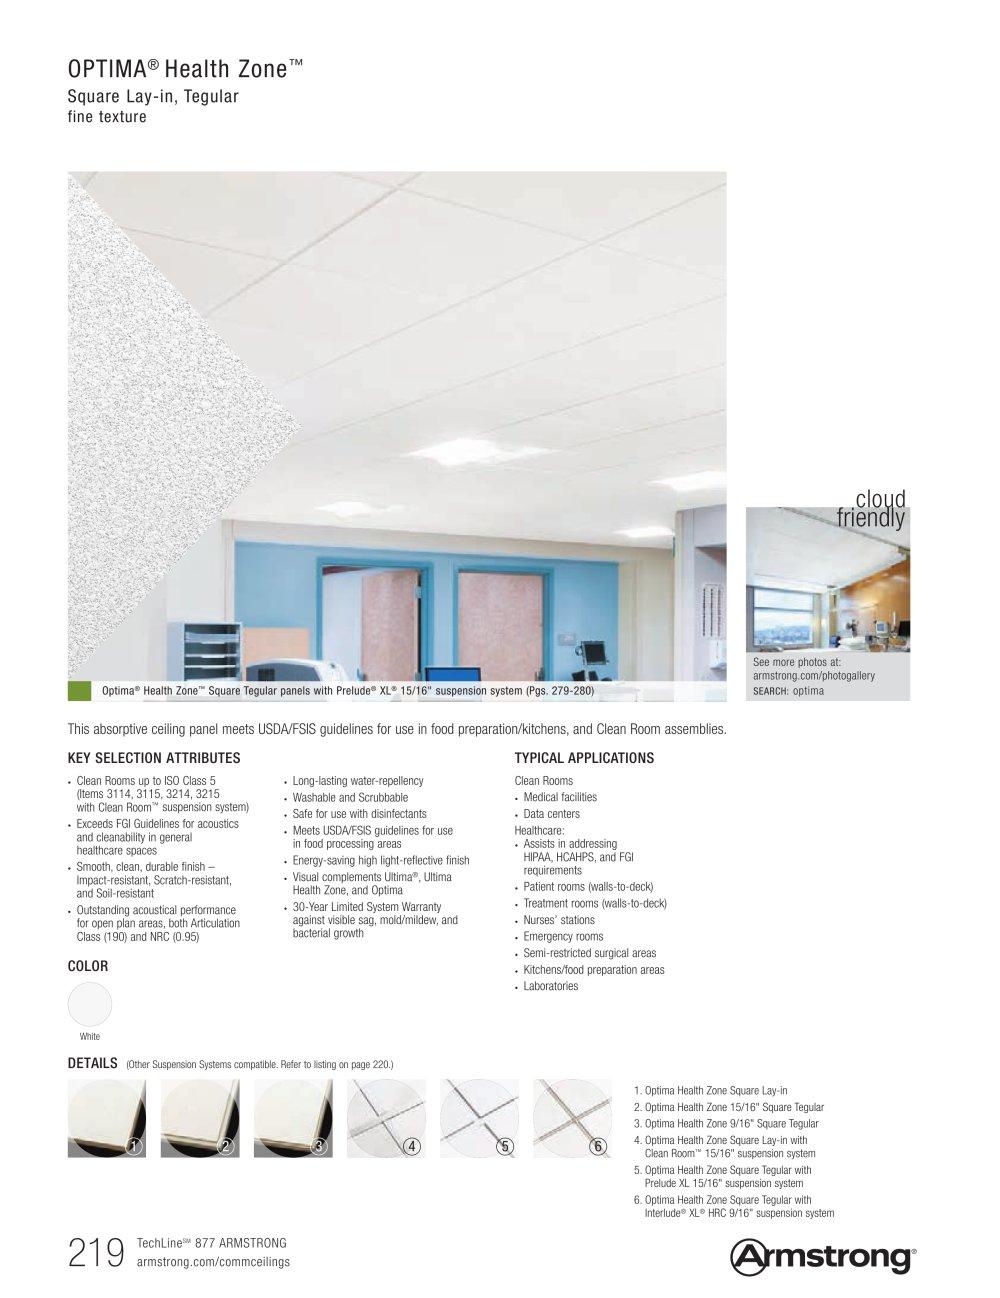 Optima Health Zone Amstrong PDF Catalogue Technical Documentation